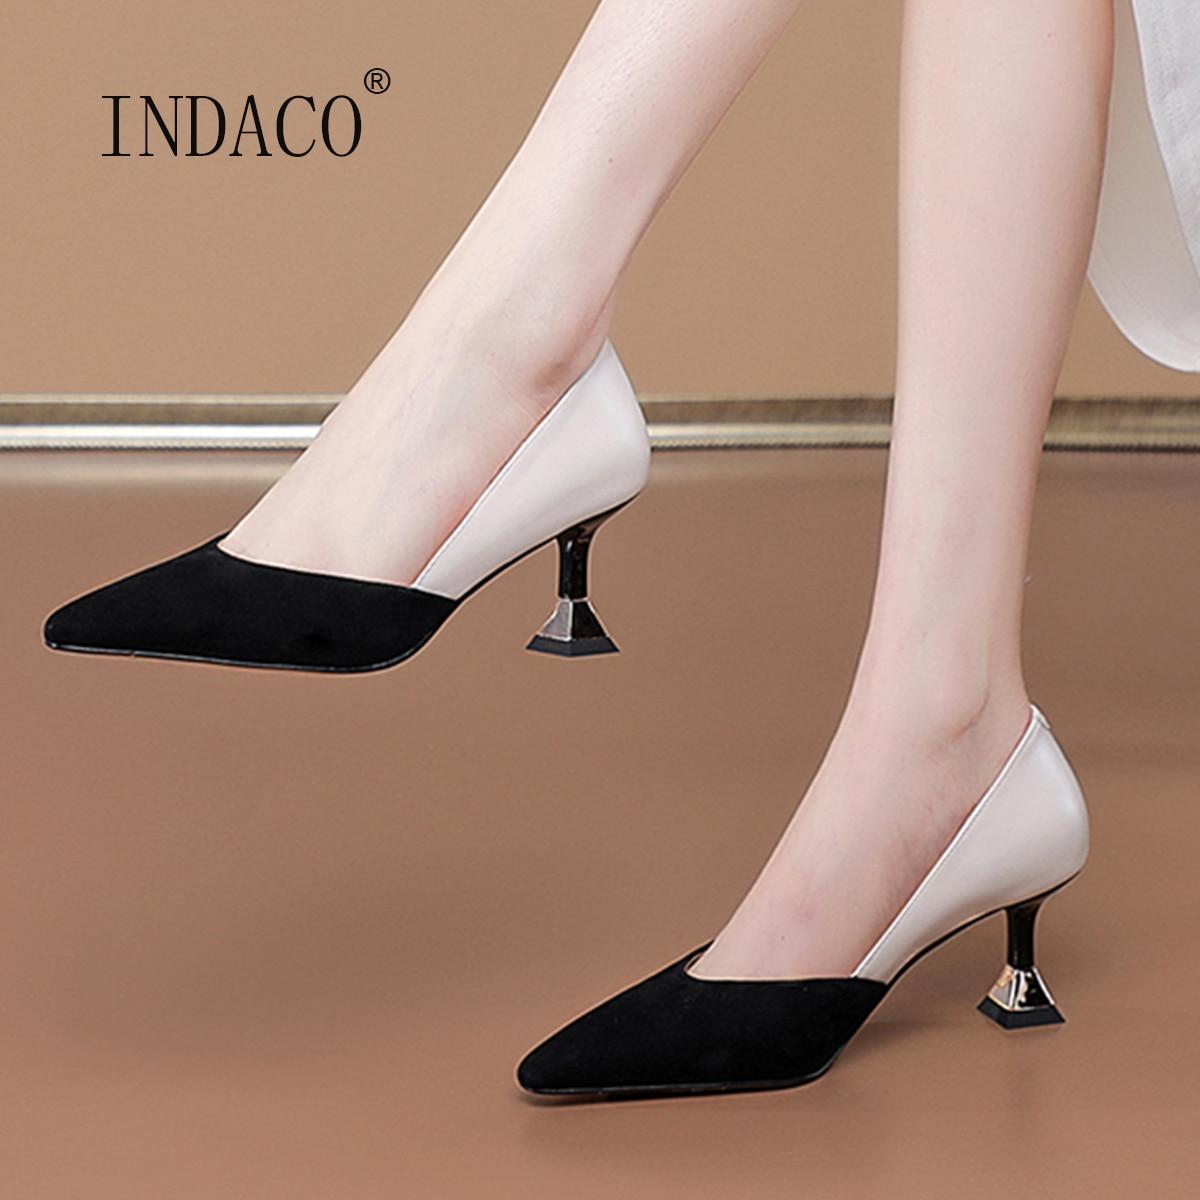 Sandalias عالية الكعب موضة Kid Suede منتصف الألوان الصنادل أحذية النساء أشار تو الأسود النبيذ الأحمر أحذية الحفلات 6.5 سنتيمتر حجم صغير 33